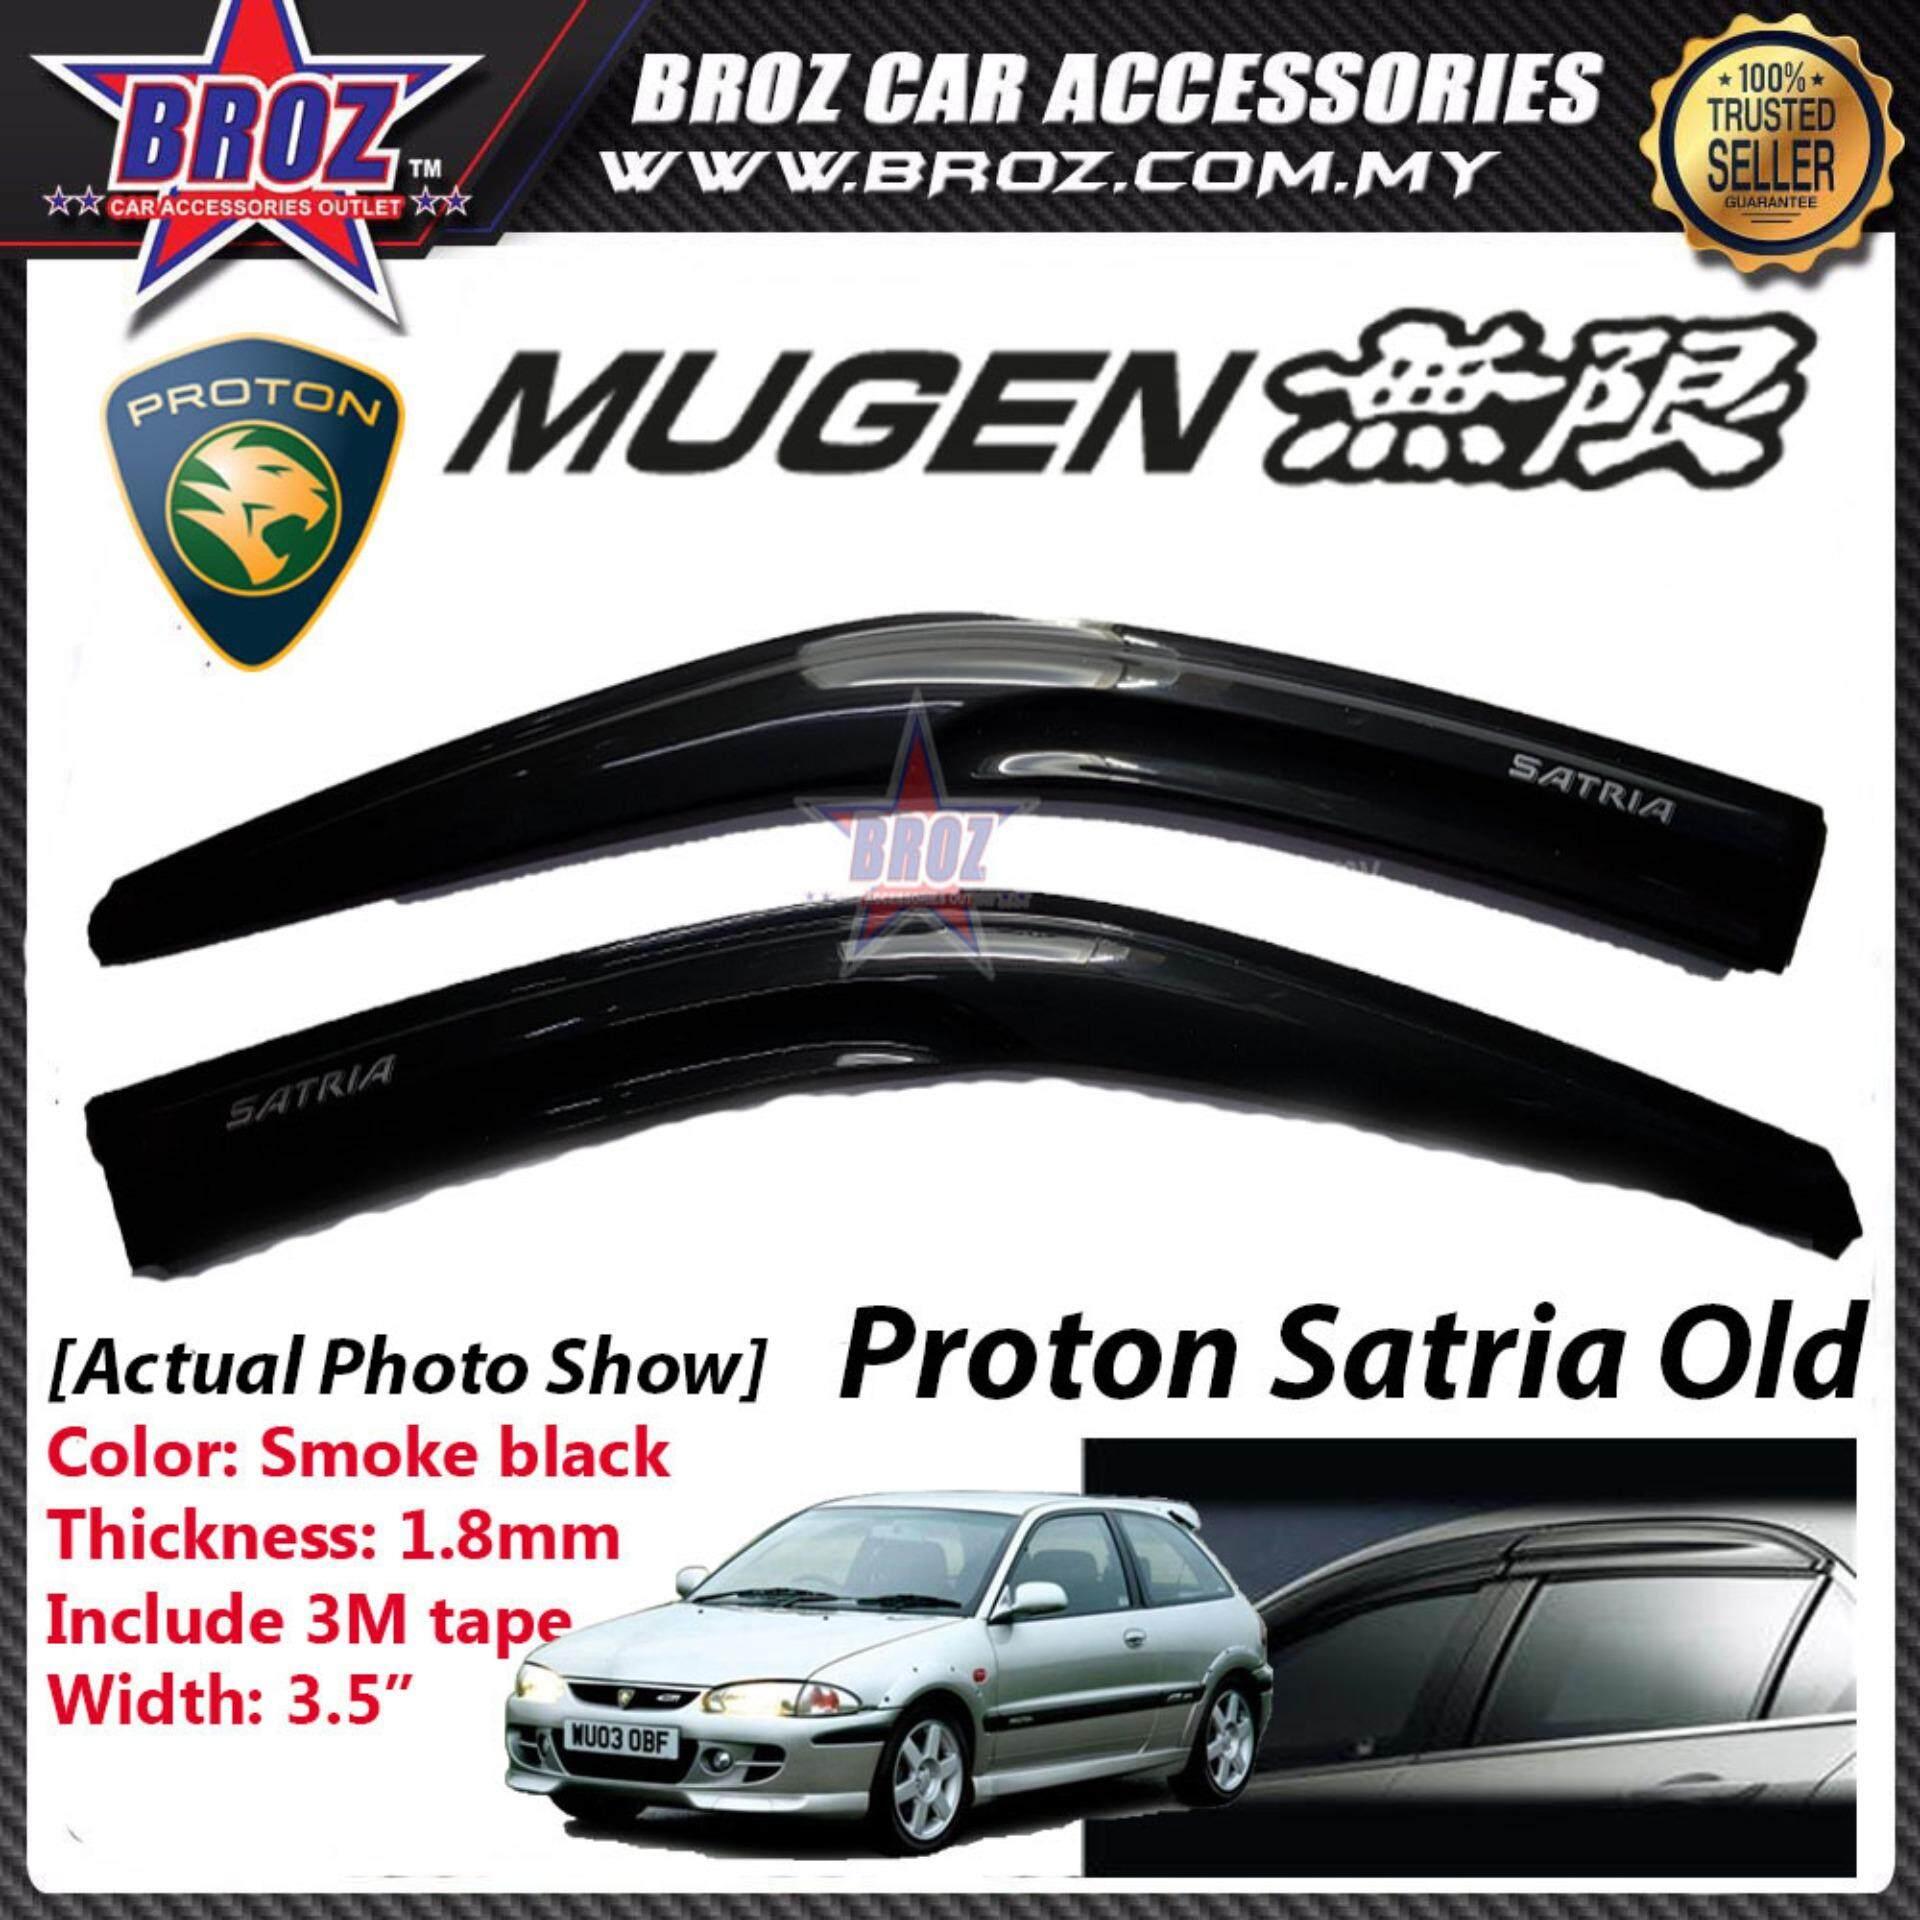 Broz Air Press Window Mugen Style Acrylic Door Visor Wind Deflector 9CM For Proton Satria  (2PCS/SET)